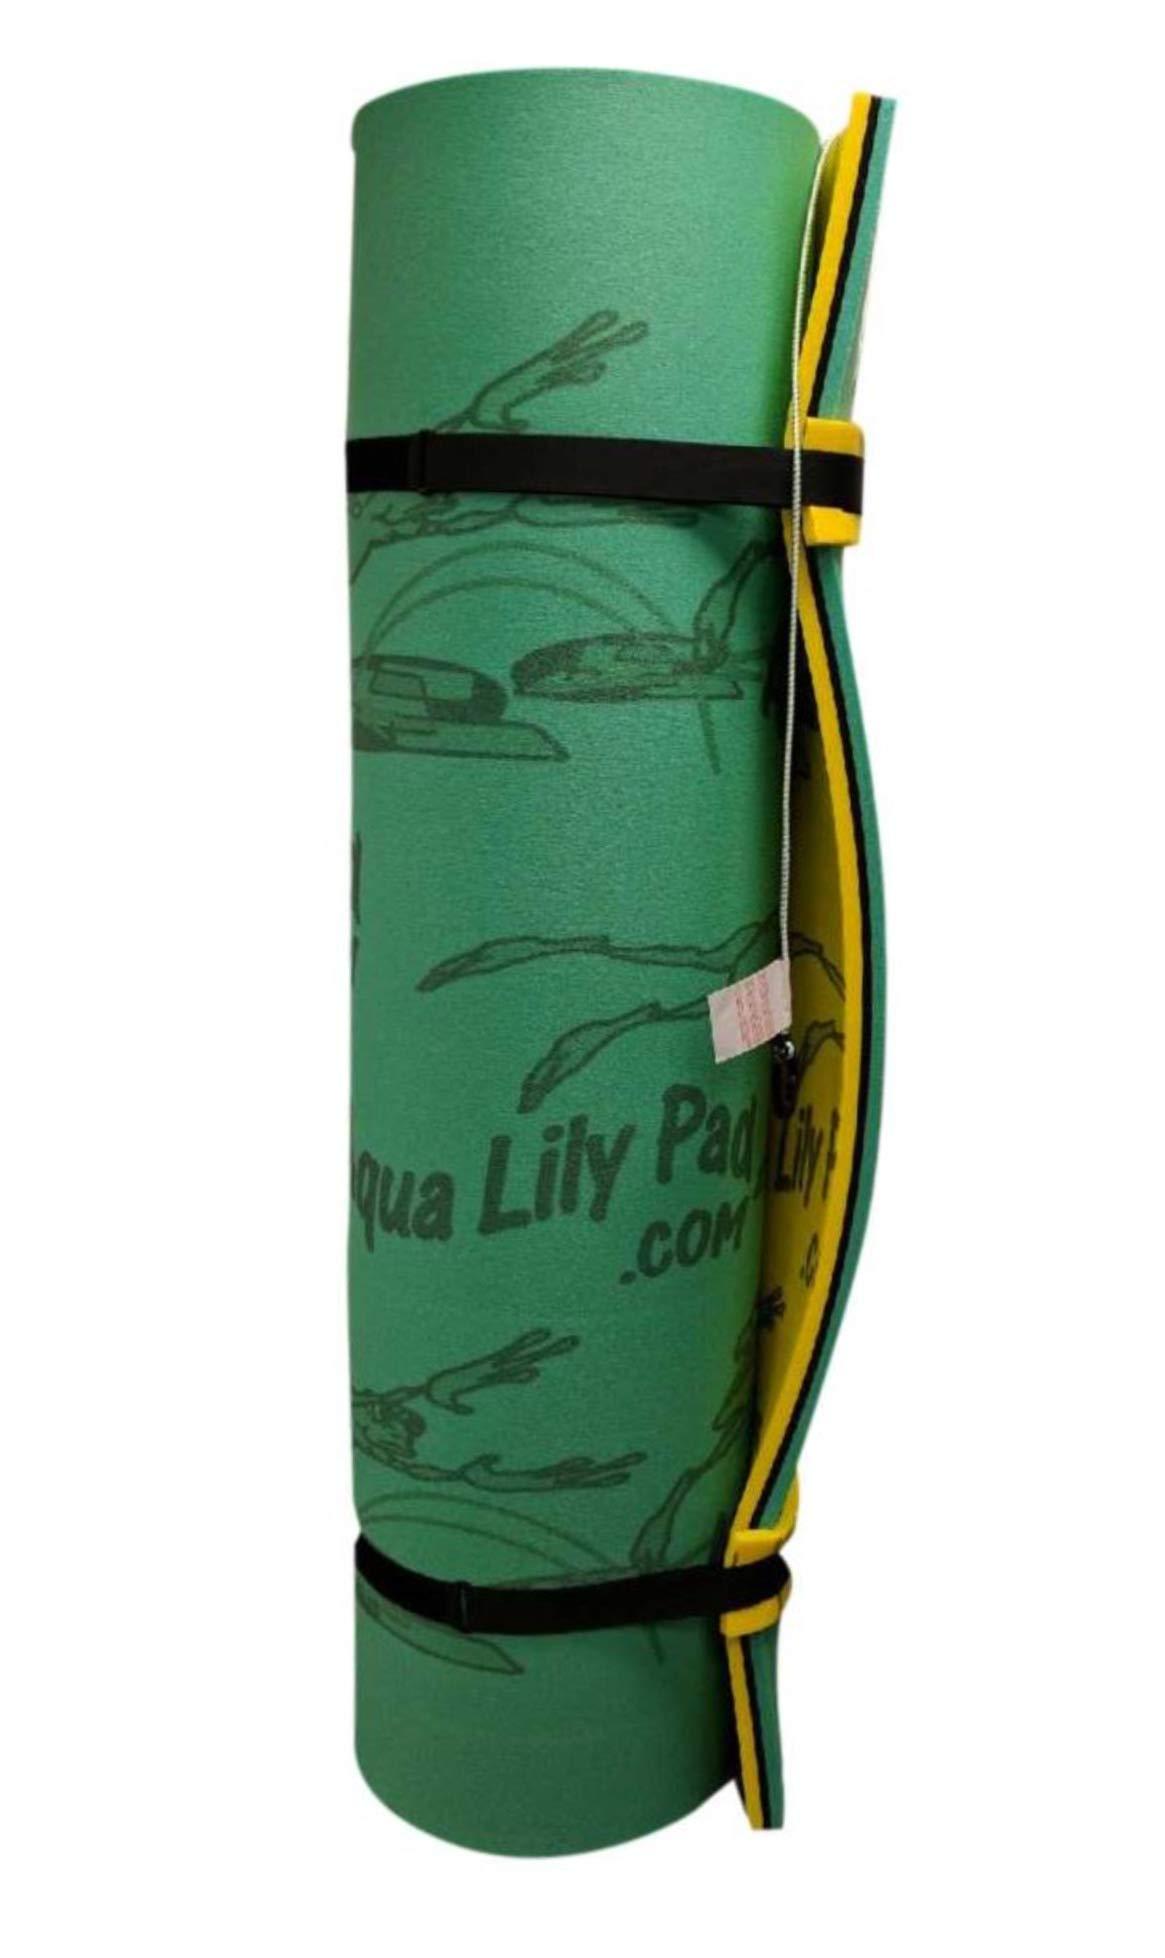 Aqua Lily Pad Bullfrog 15' x 6' (3 ply, 1 3/4'') Floating Foam Pad (for Lakes, Pools, Rivers) (15' x 6') by Aqua Lily (Image #1)